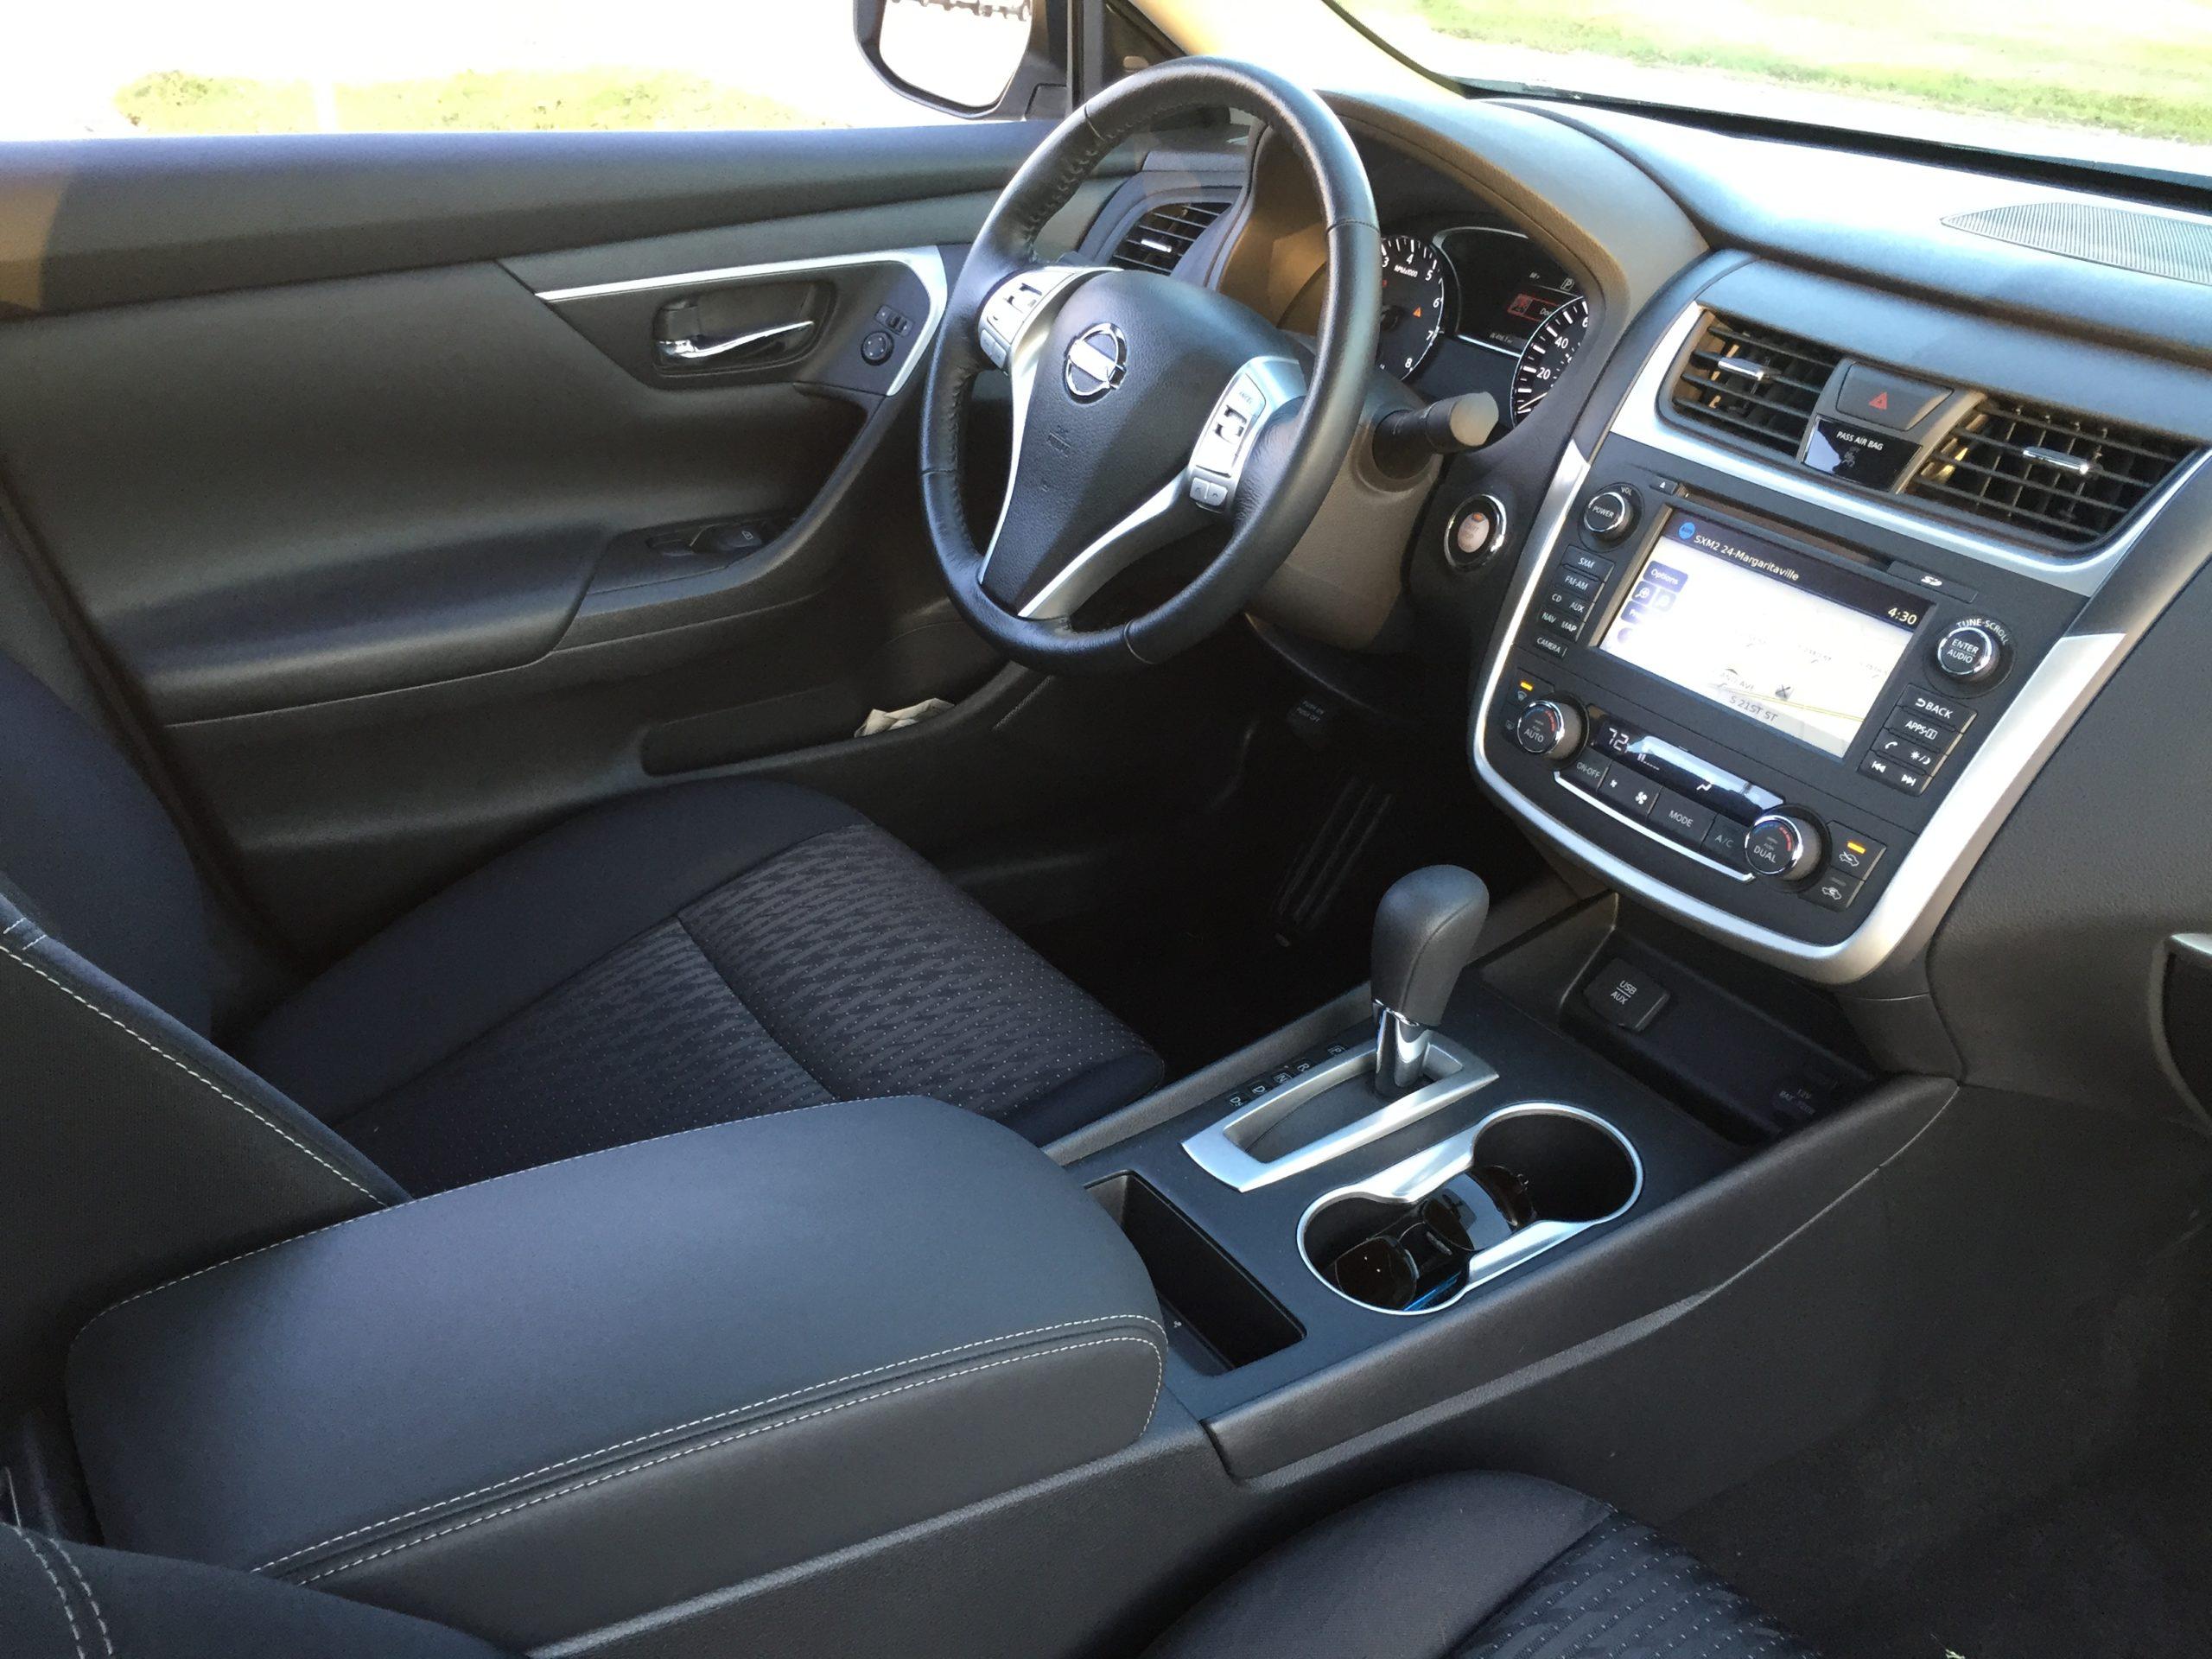 Nissan Dealers Houston >> 2016 Nissan Altima SV | In Wheel Time